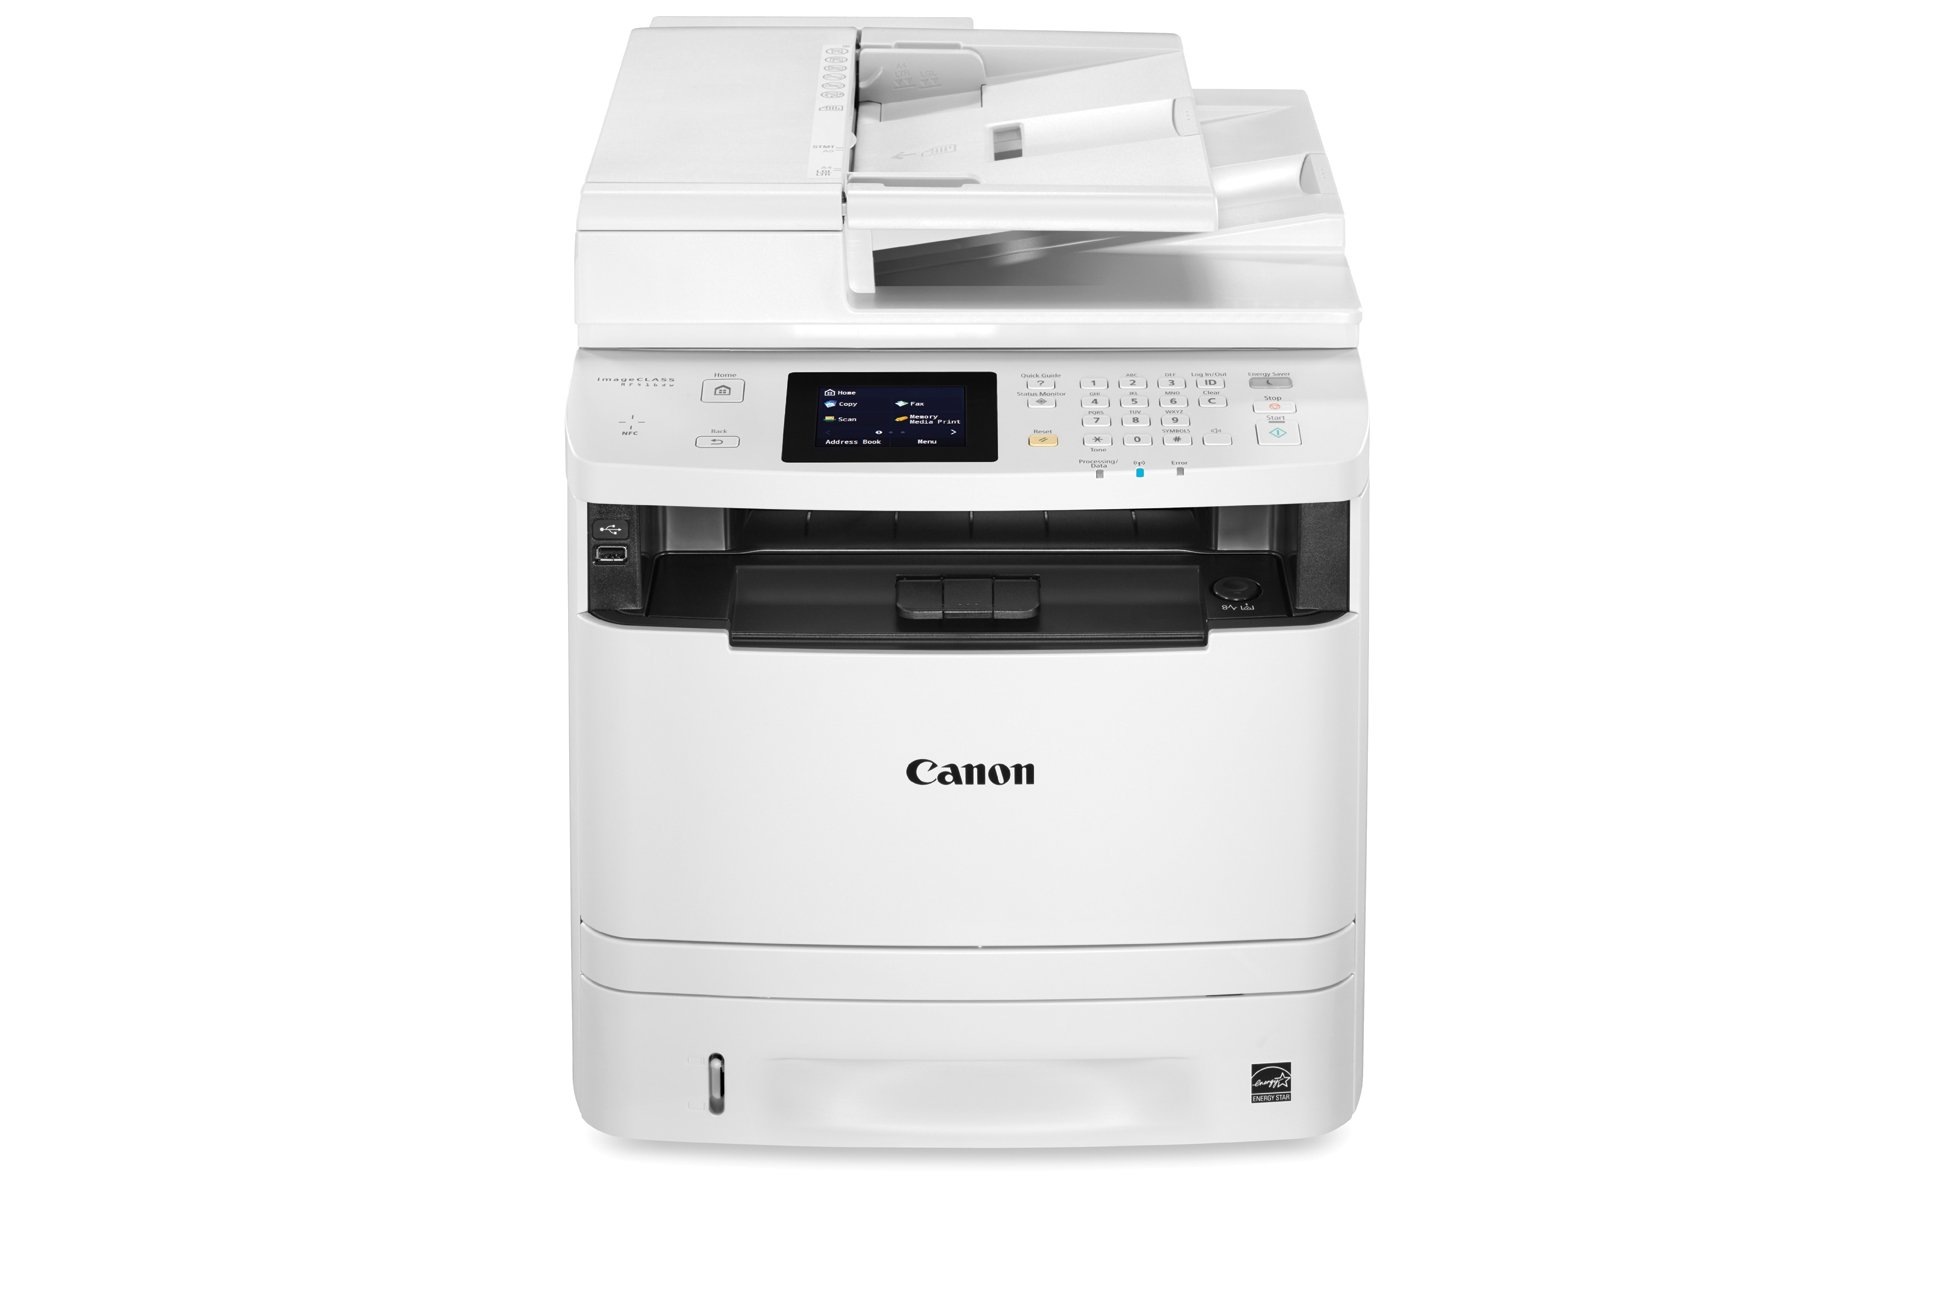 Canon MF416dw Imageclass Wireless Monochrome Printer with Scanner, Copier & Fax